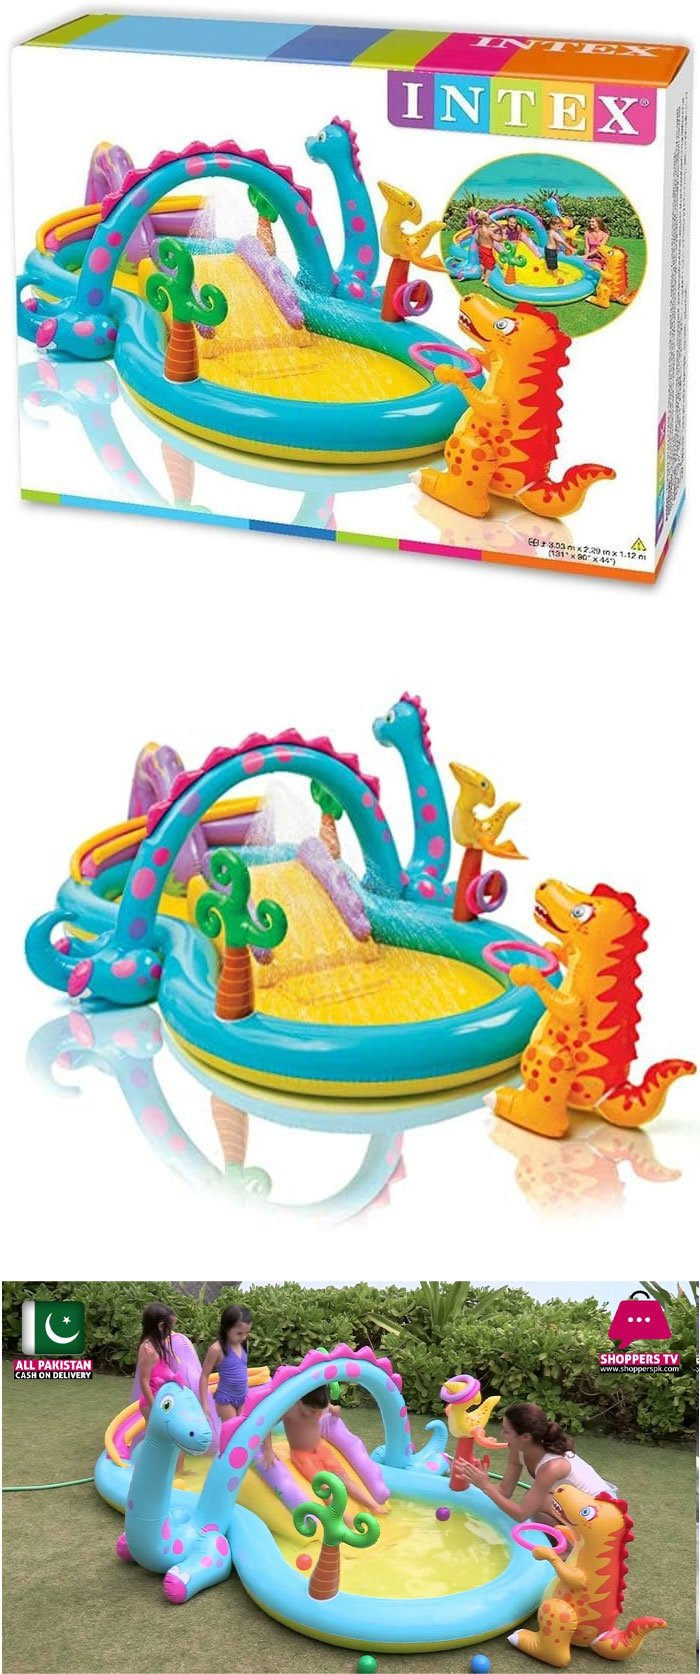 Intex Dinoland Inflatable Play Center - Age 3+ - 57135